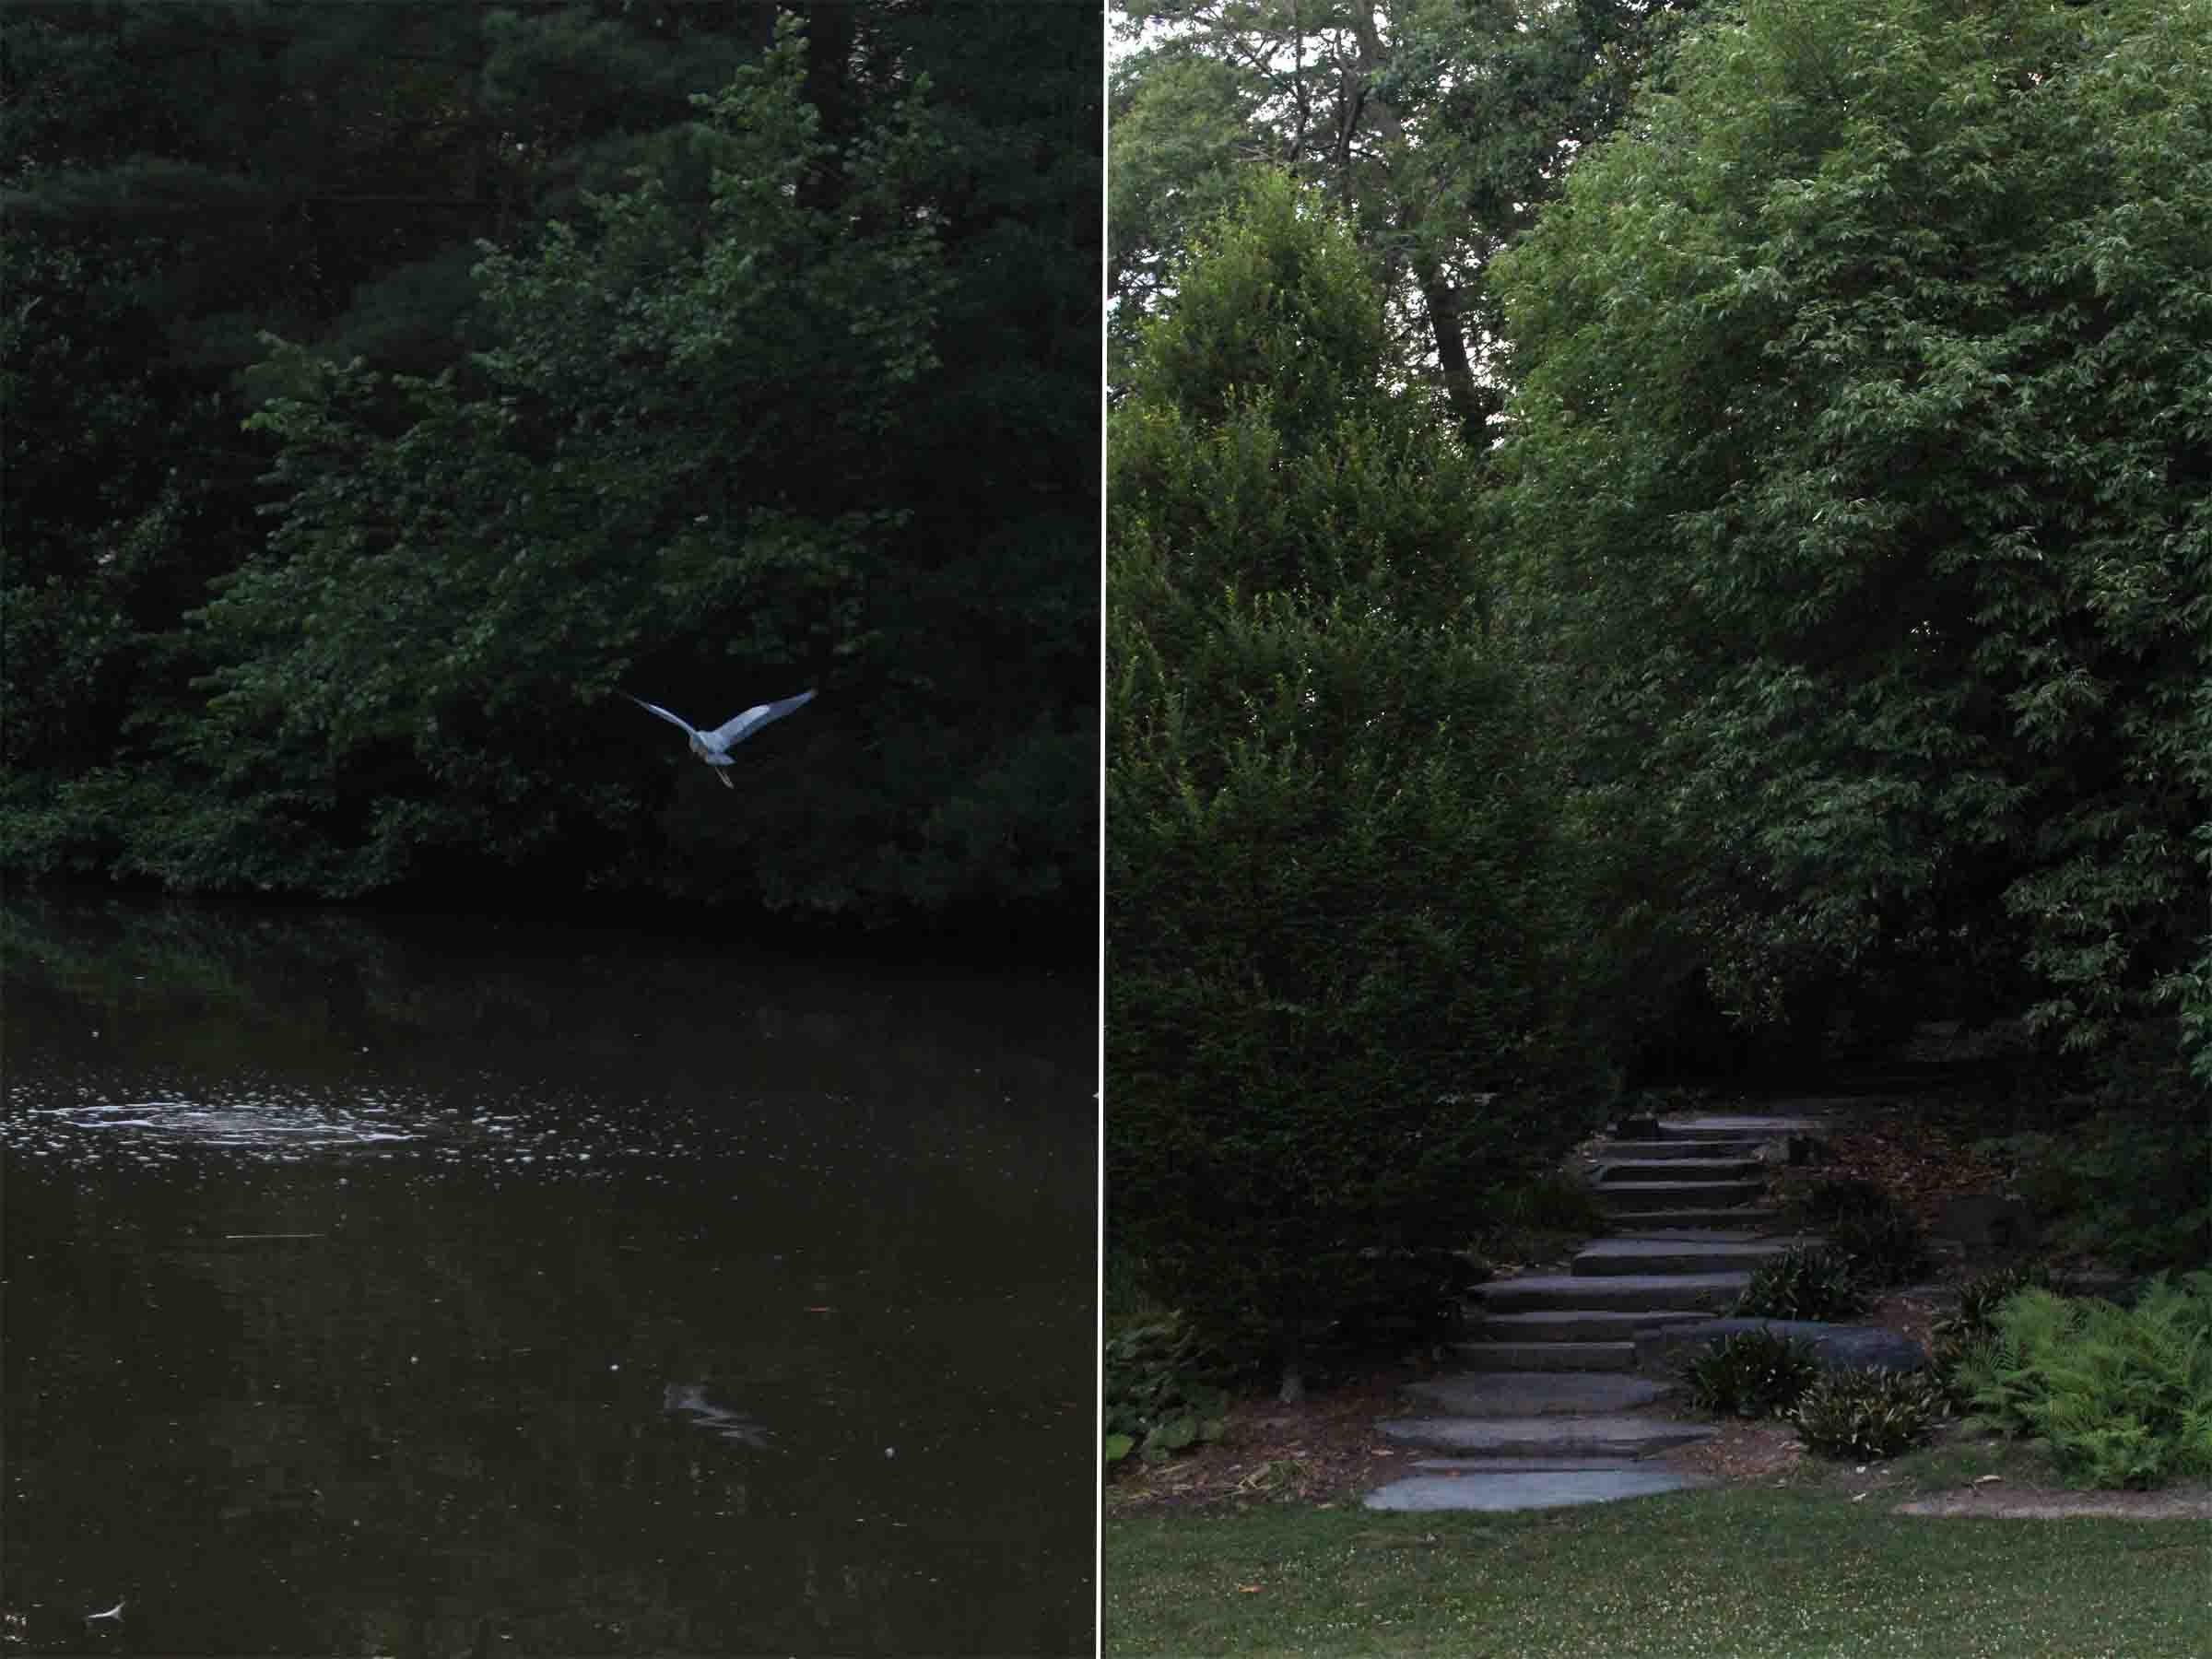 A summertime study session at Duke Gardens!